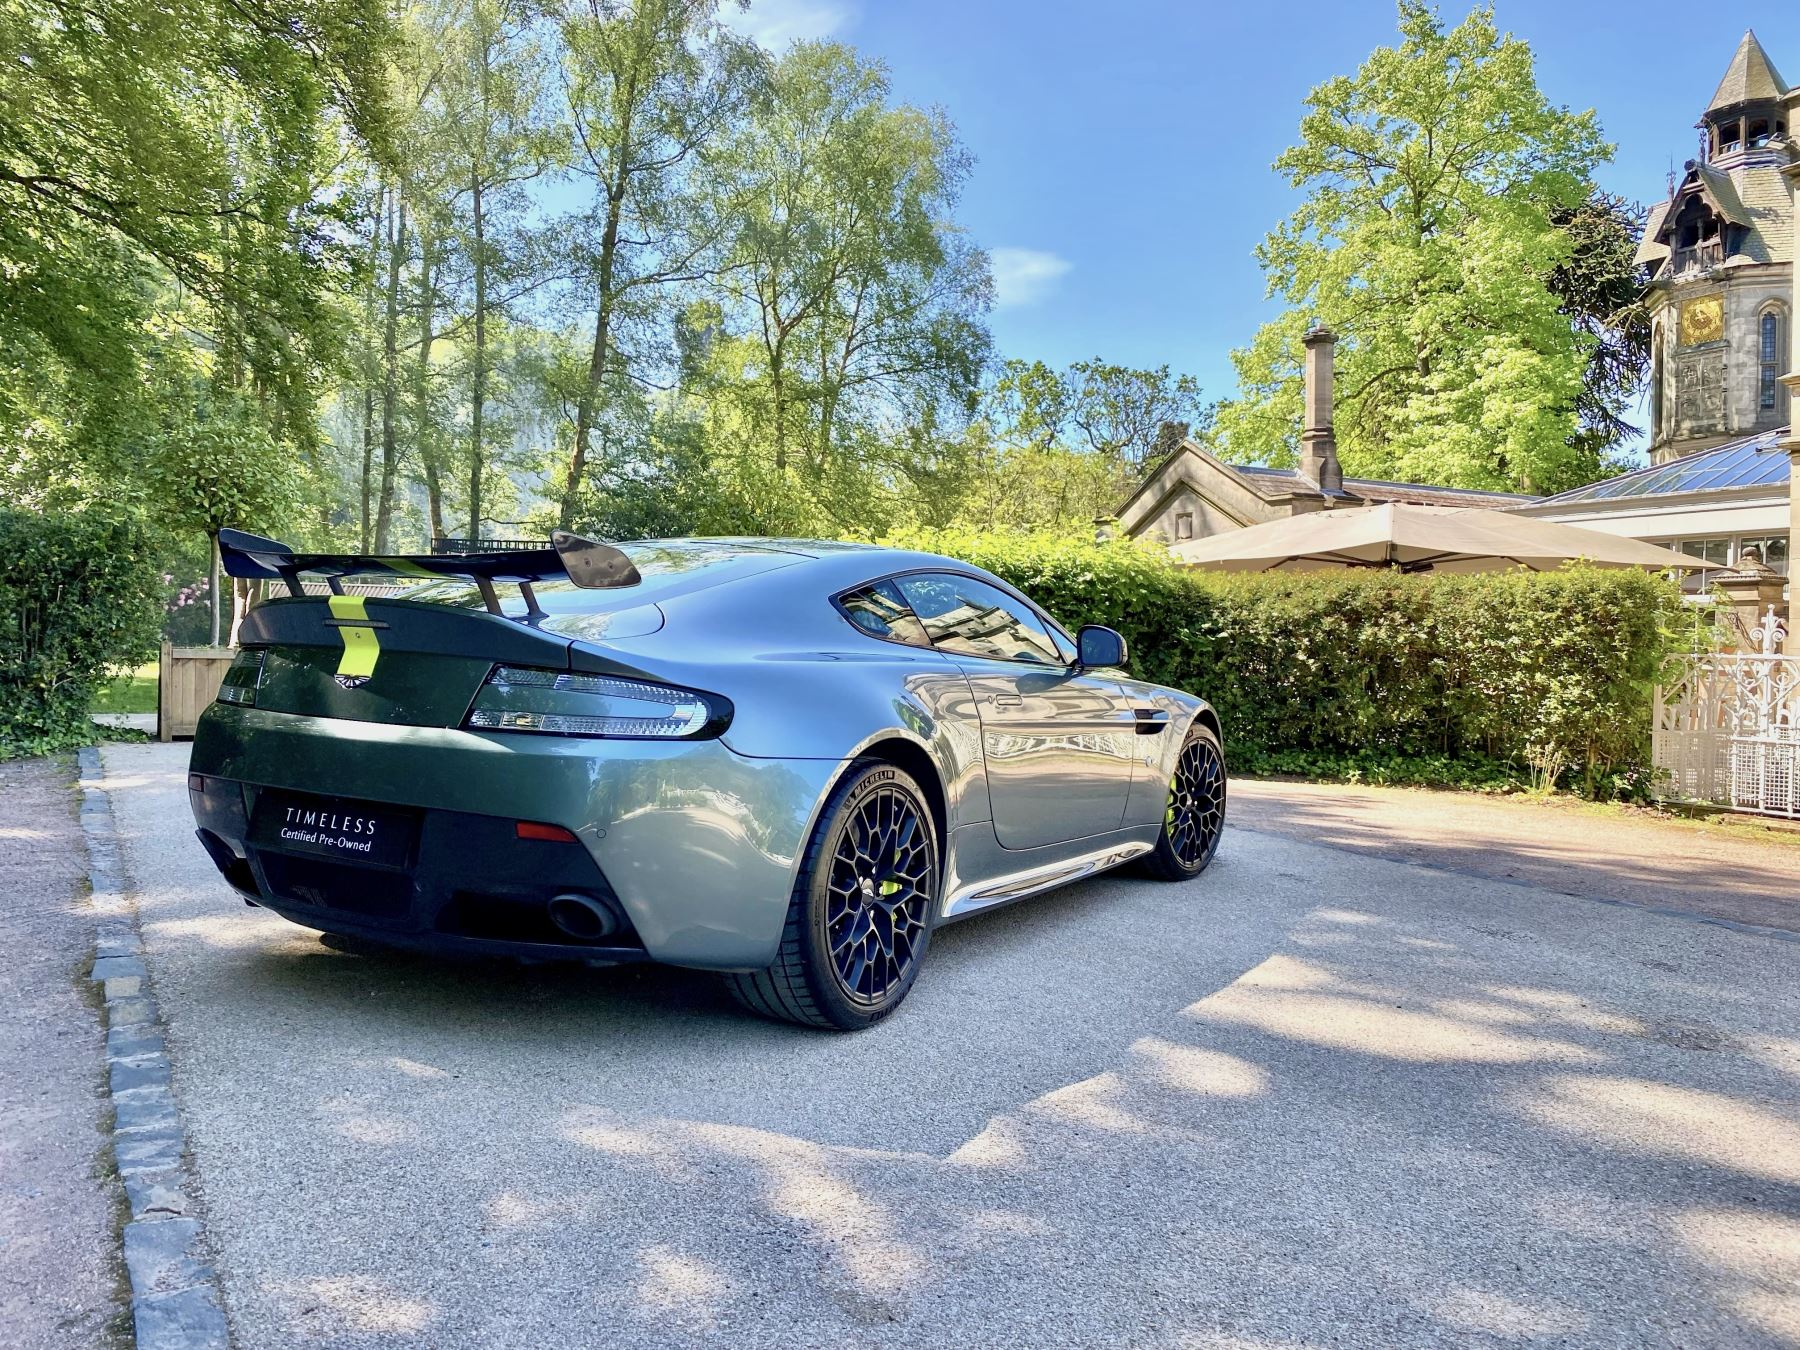 Aston Martin V12 Vantage AMR 6.0 V12 600BHP Manual 1 of 100.     1 Owner From New, Full Aston Martin History. image 20